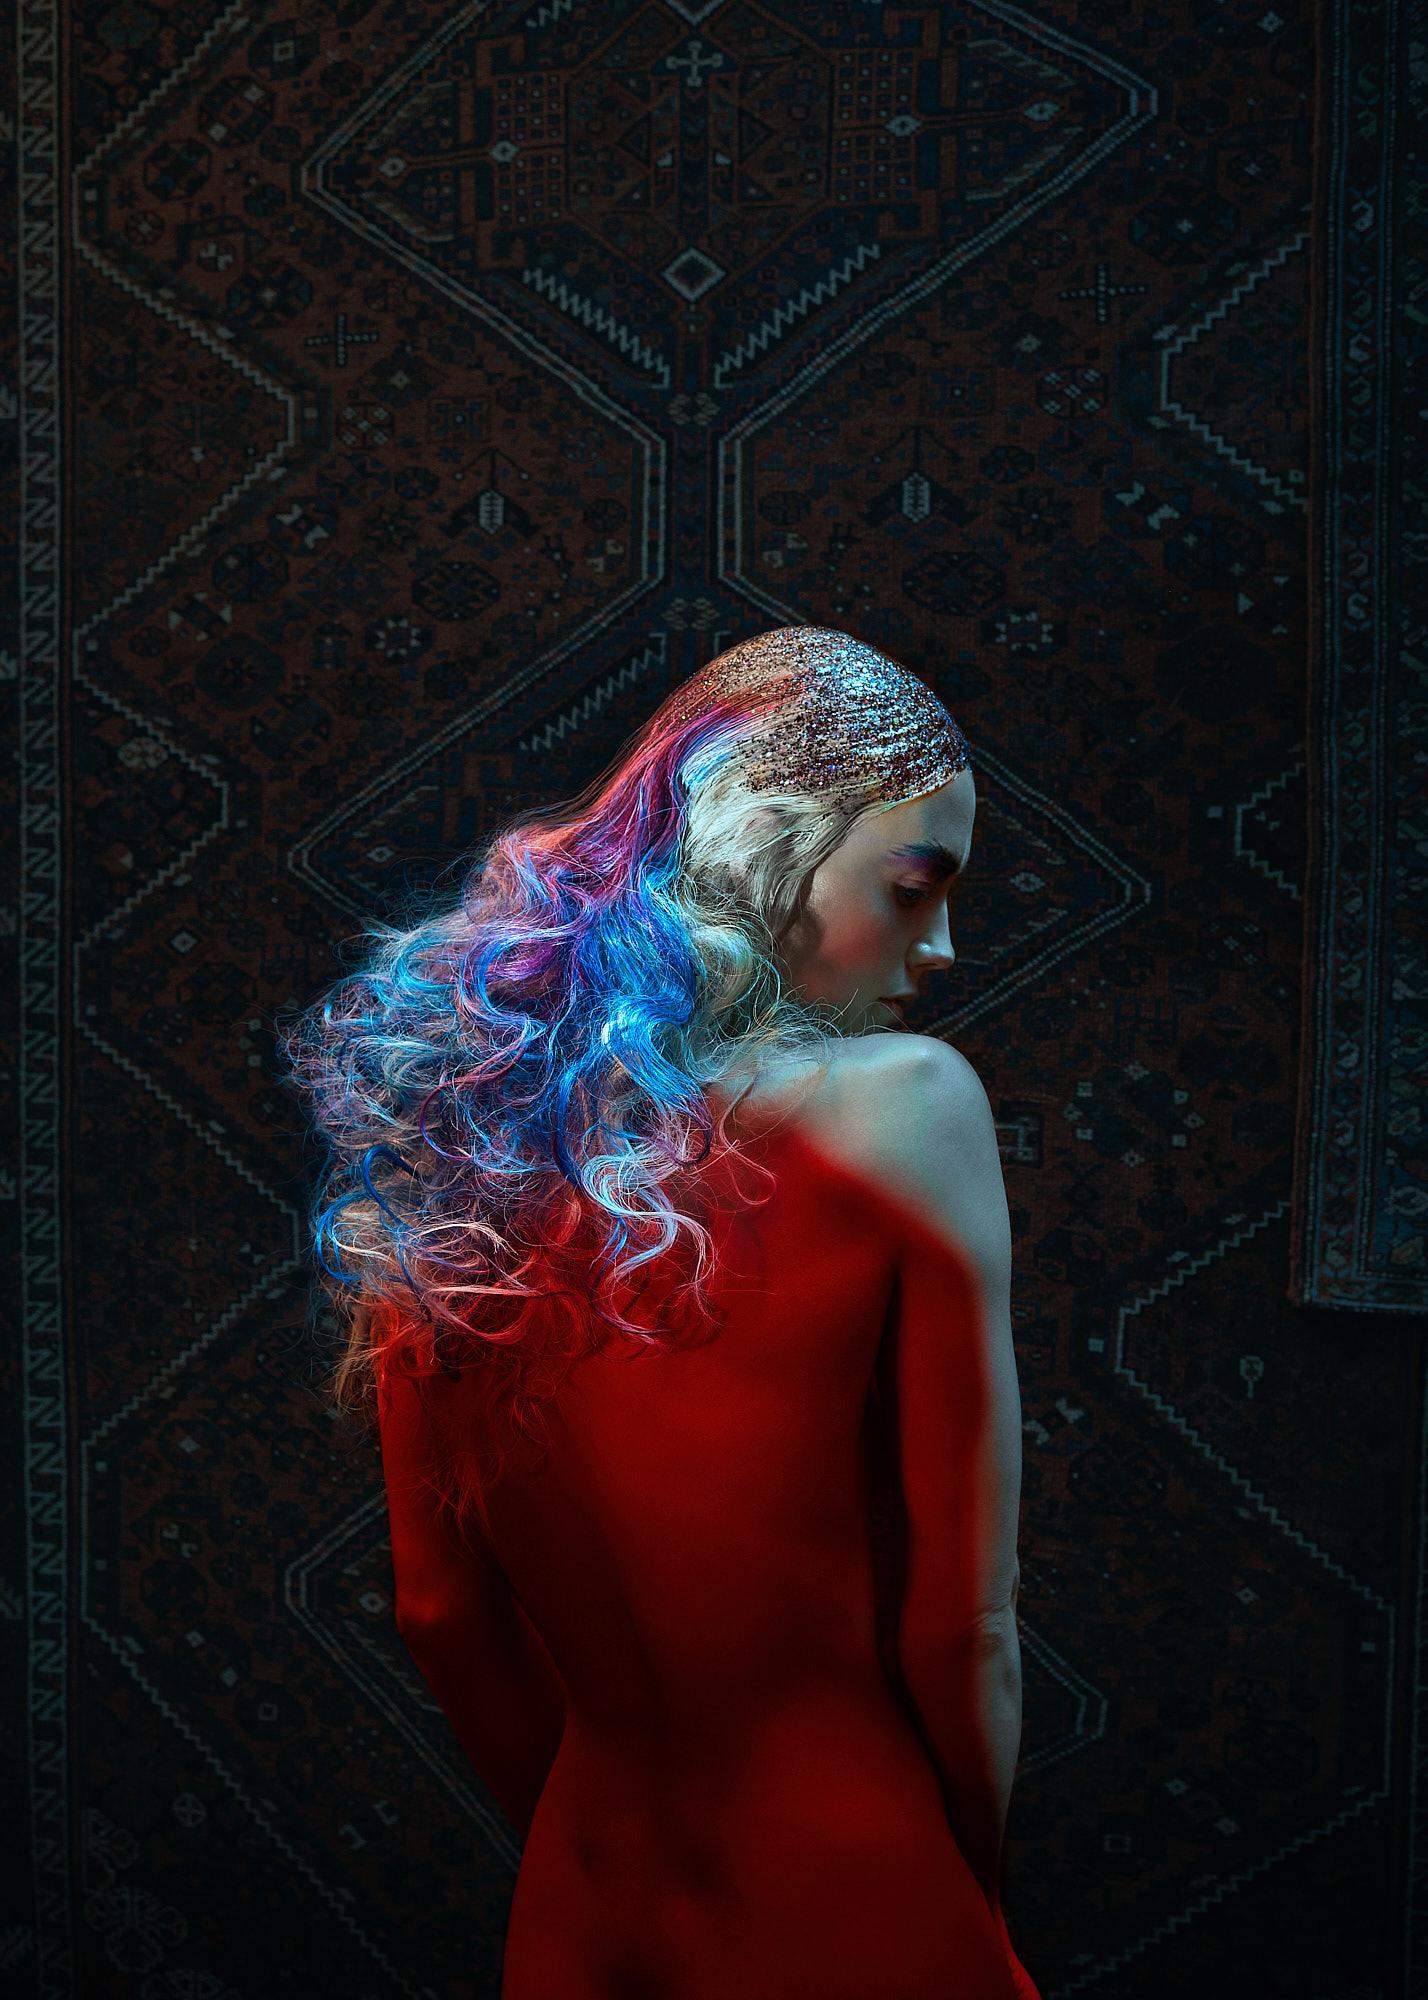 ATWINS_Red_Light_Glitter_0005